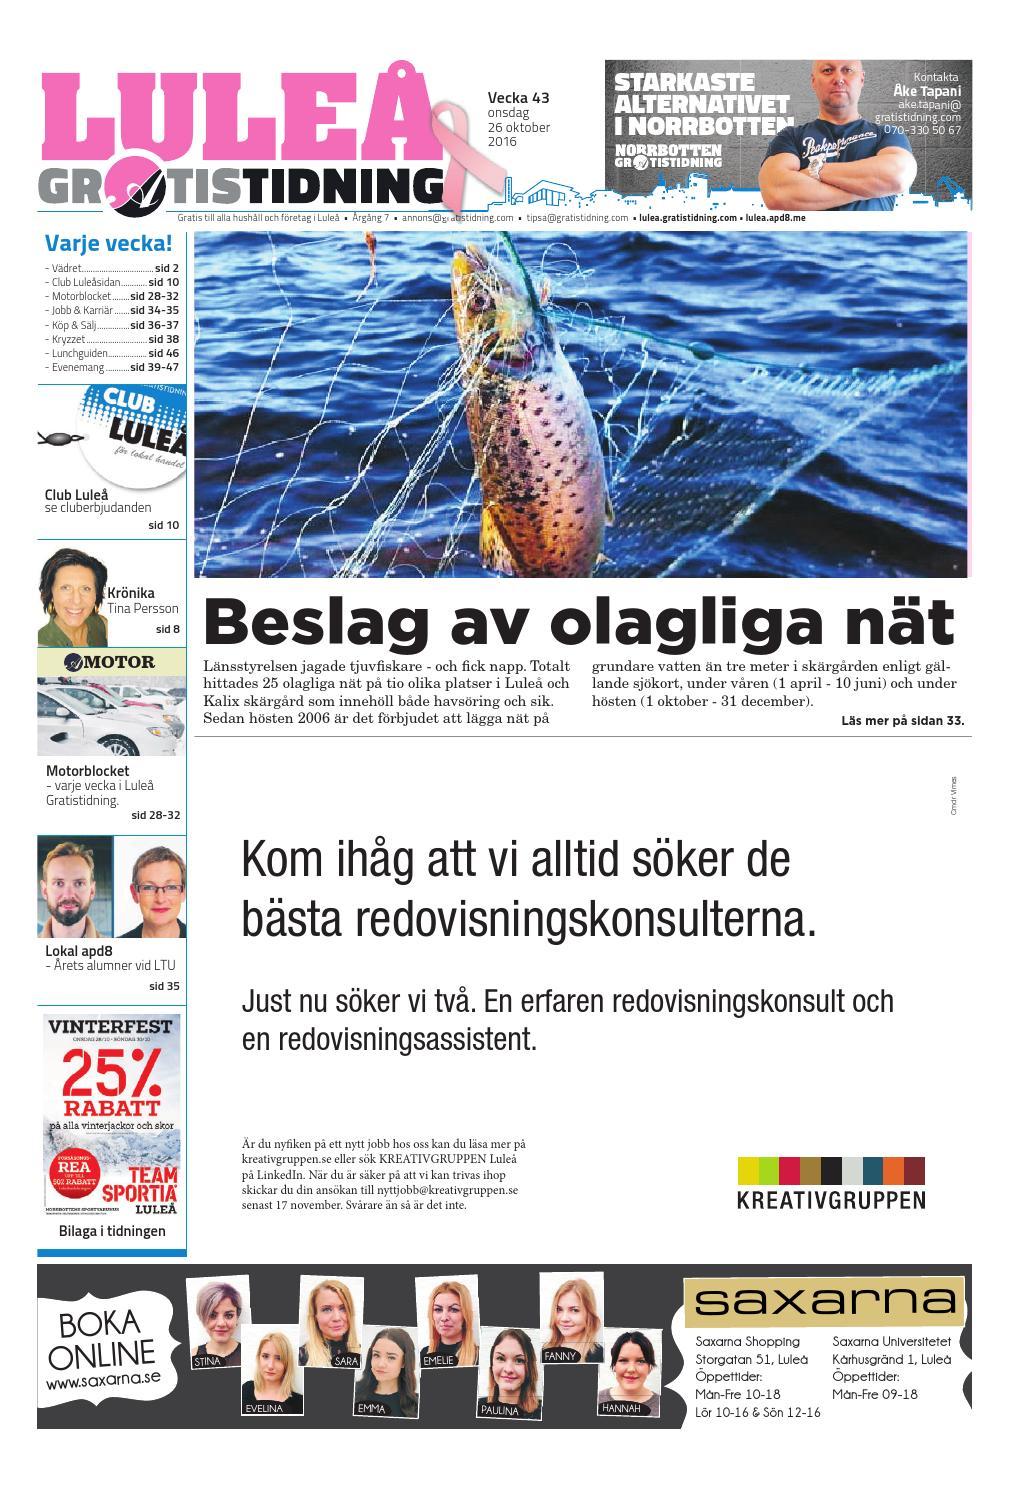 huge discount a43f7 64cf6 Luleå Gratistidning med Team Sportia bilaga by Svenska Civildatalogerna AB  - issuu